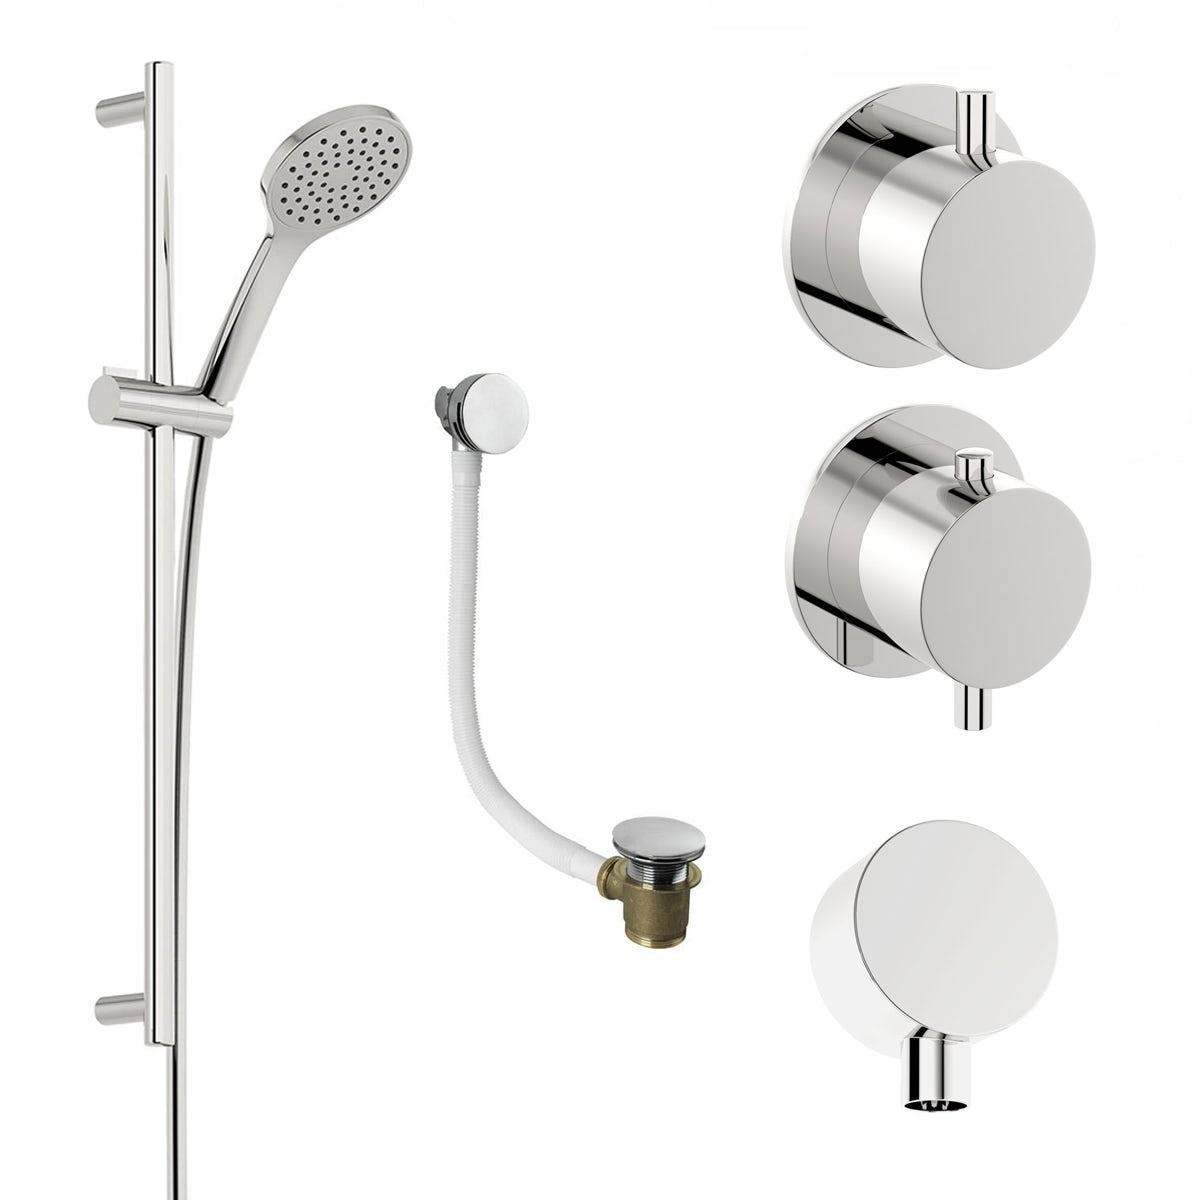 Mode Hardy thermostatic shower valve and slider rail shower bath set